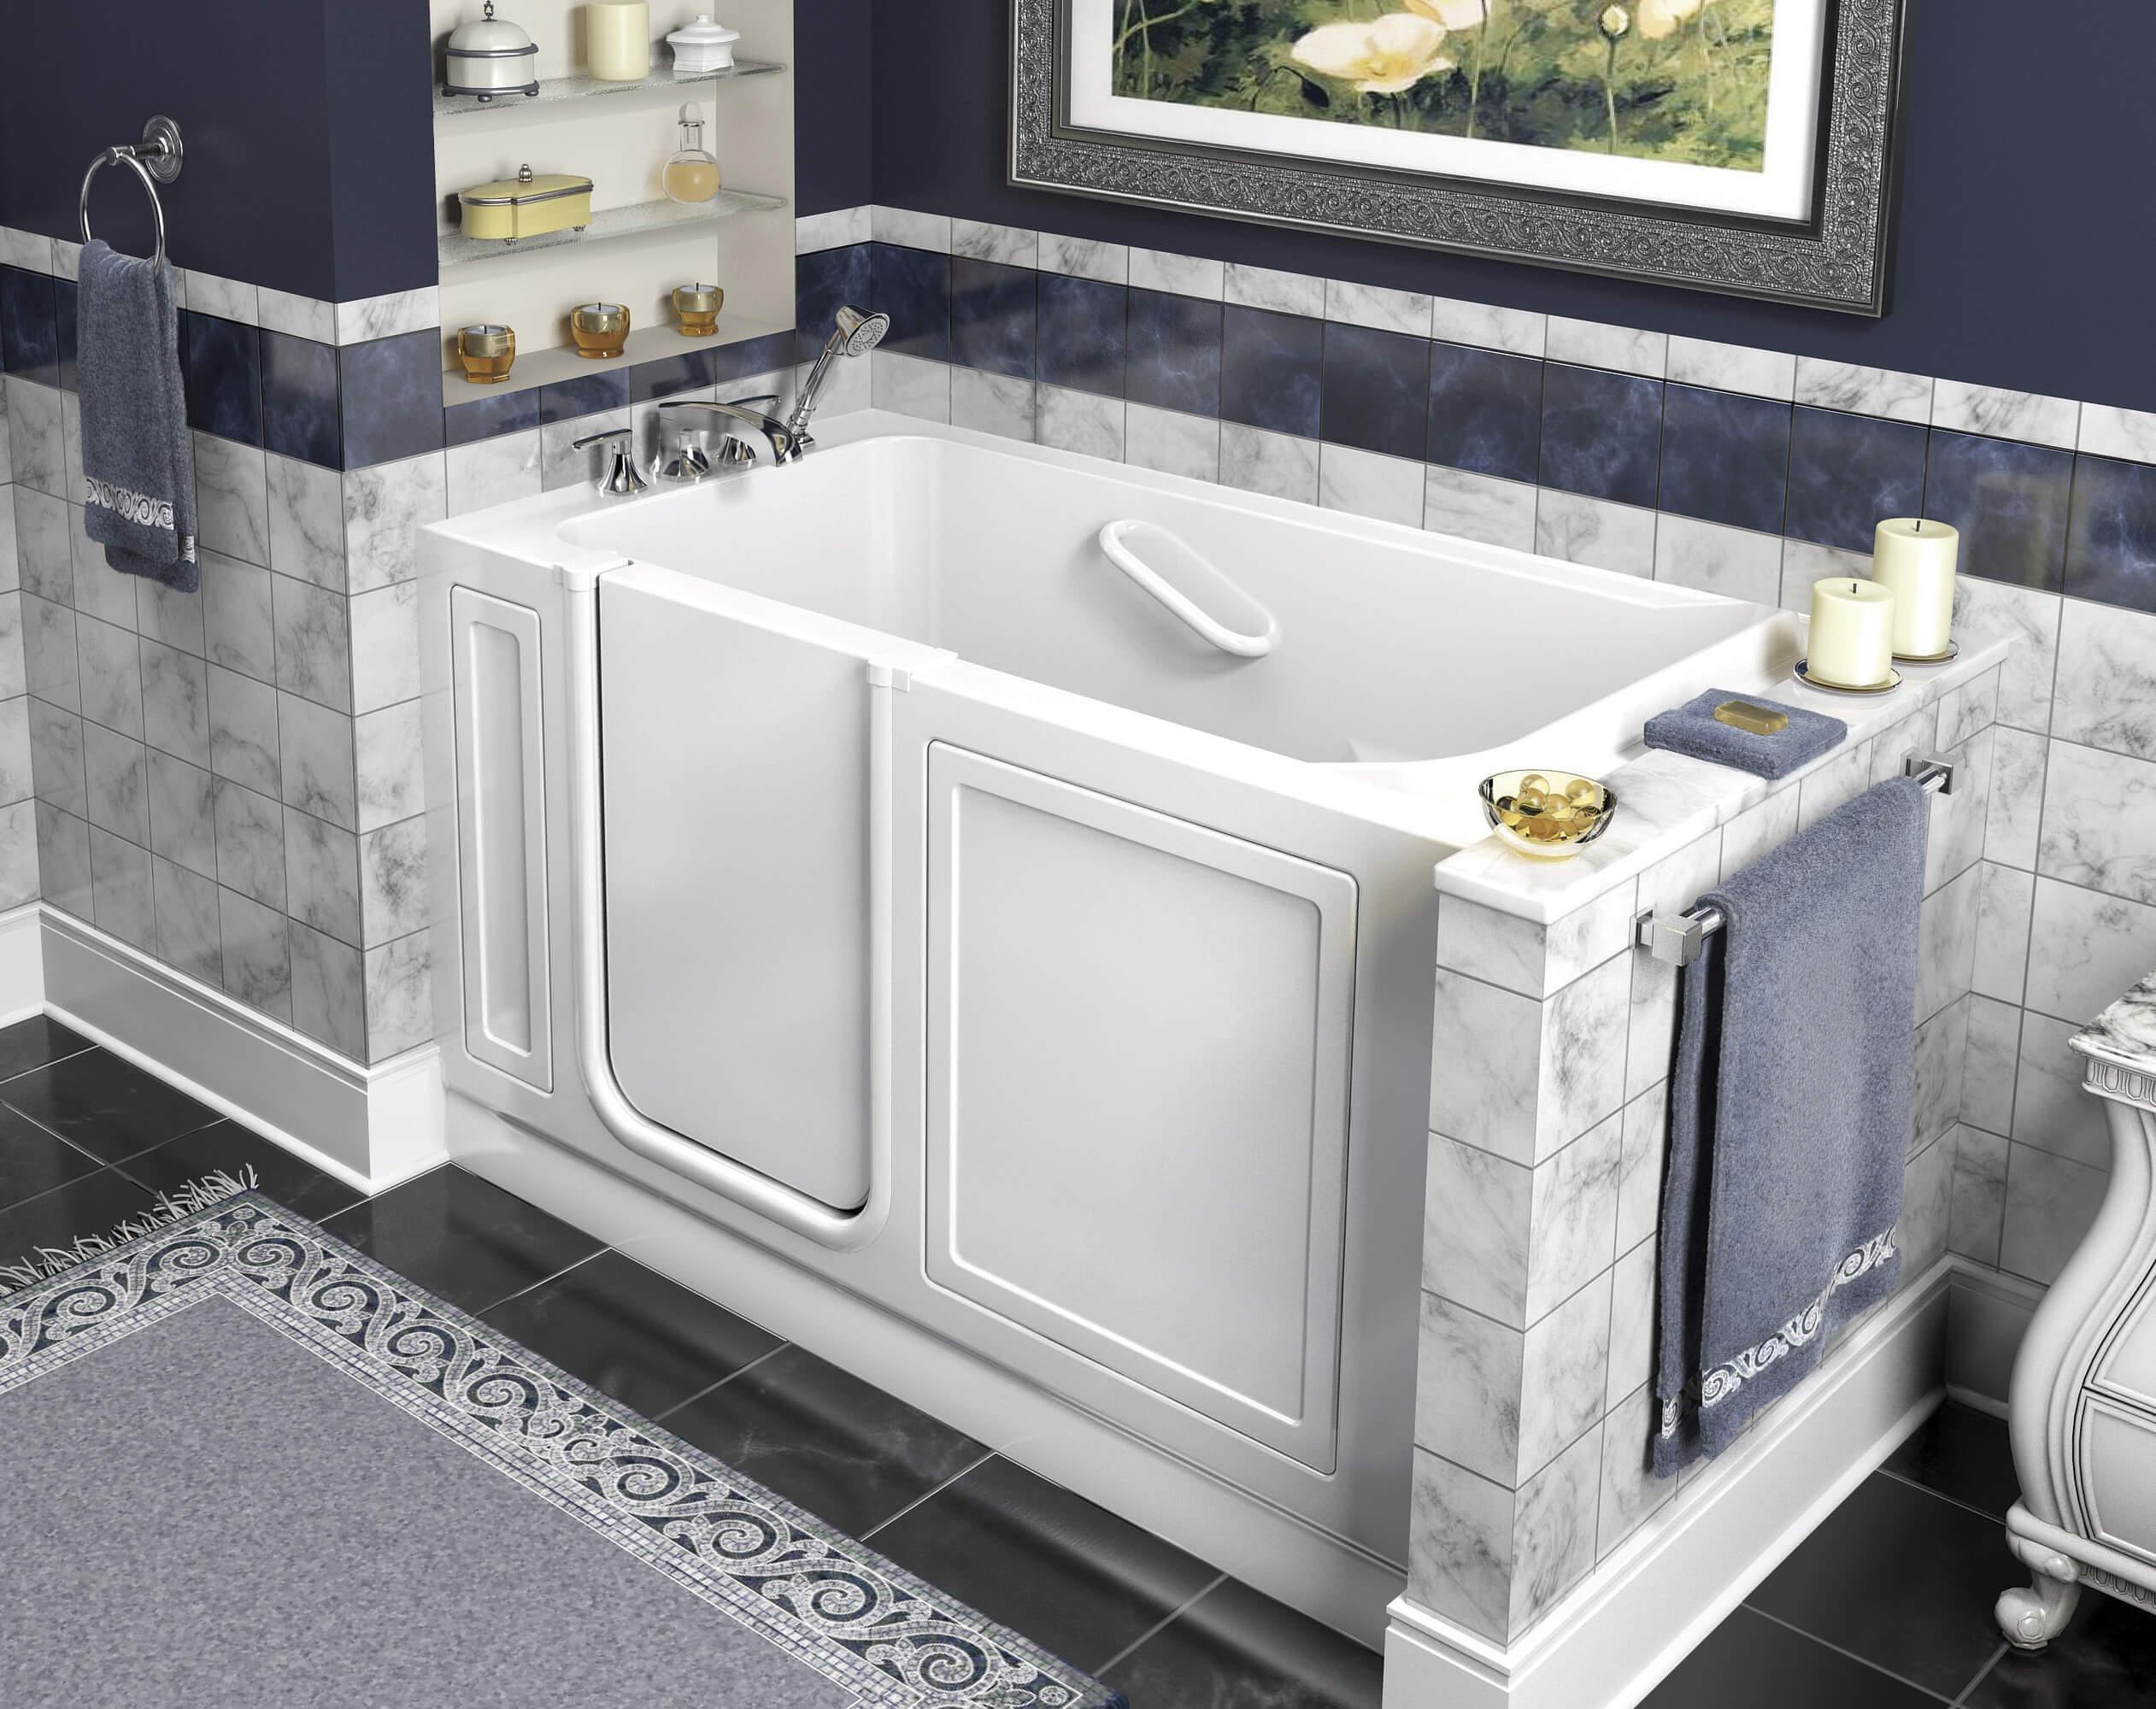 Kettering Bathroom Remodeling